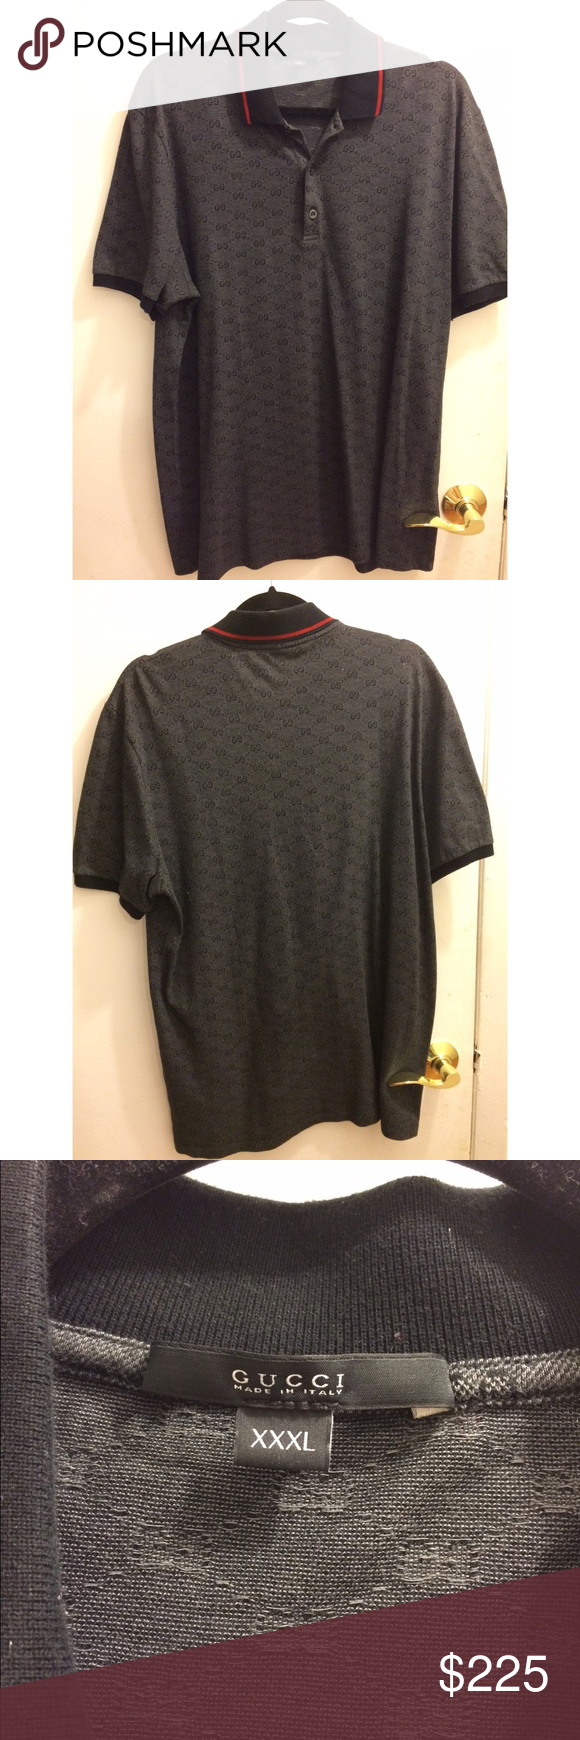 e3b4bf528 Authentic Gucci Polo Shirts